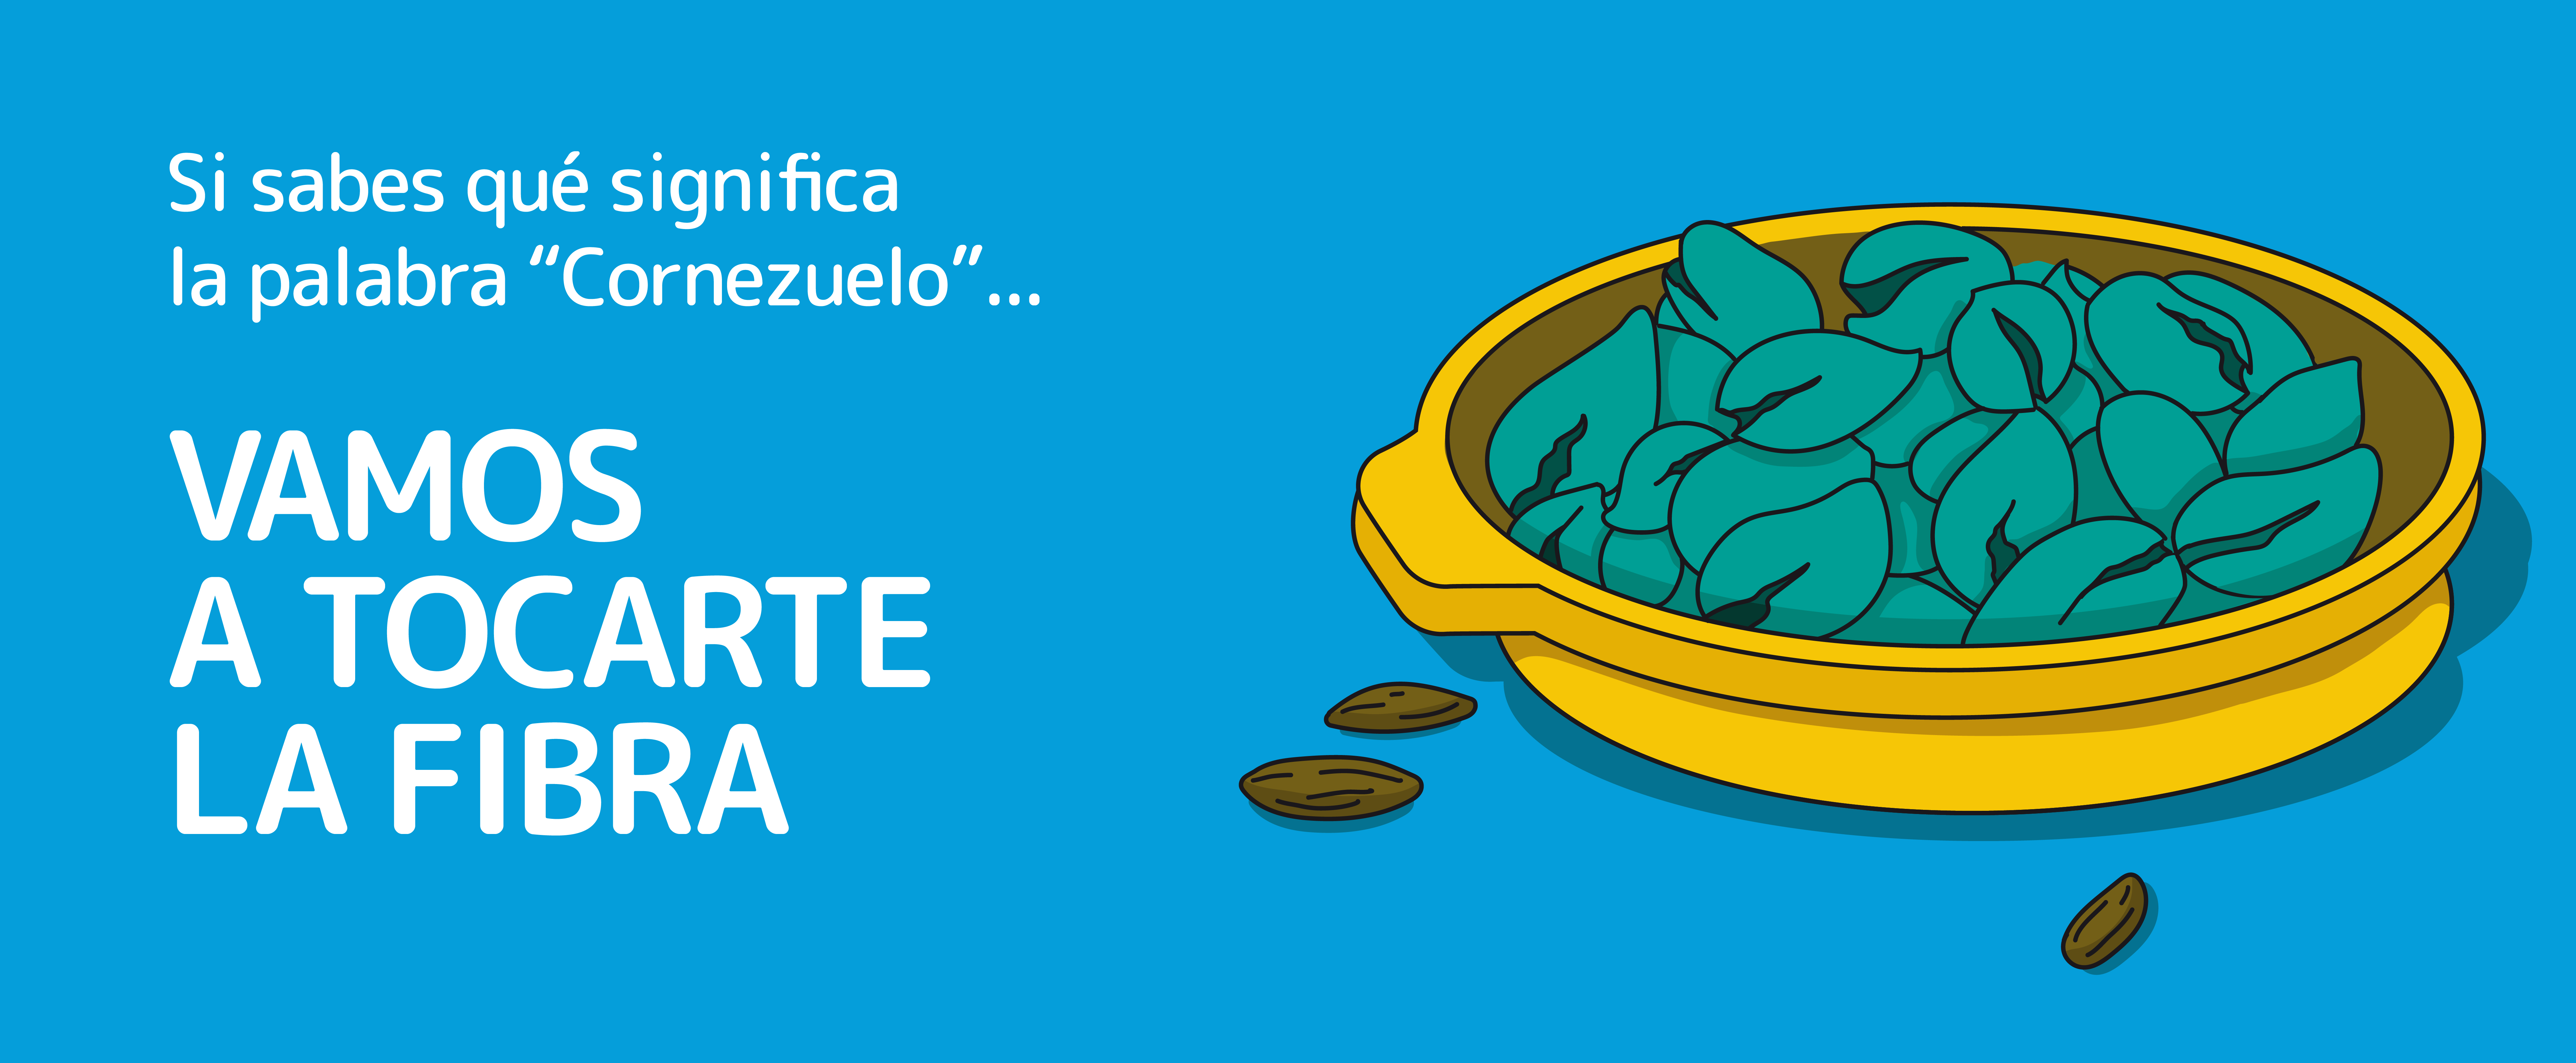 Slide_Prueba_Tamaño1 (1)